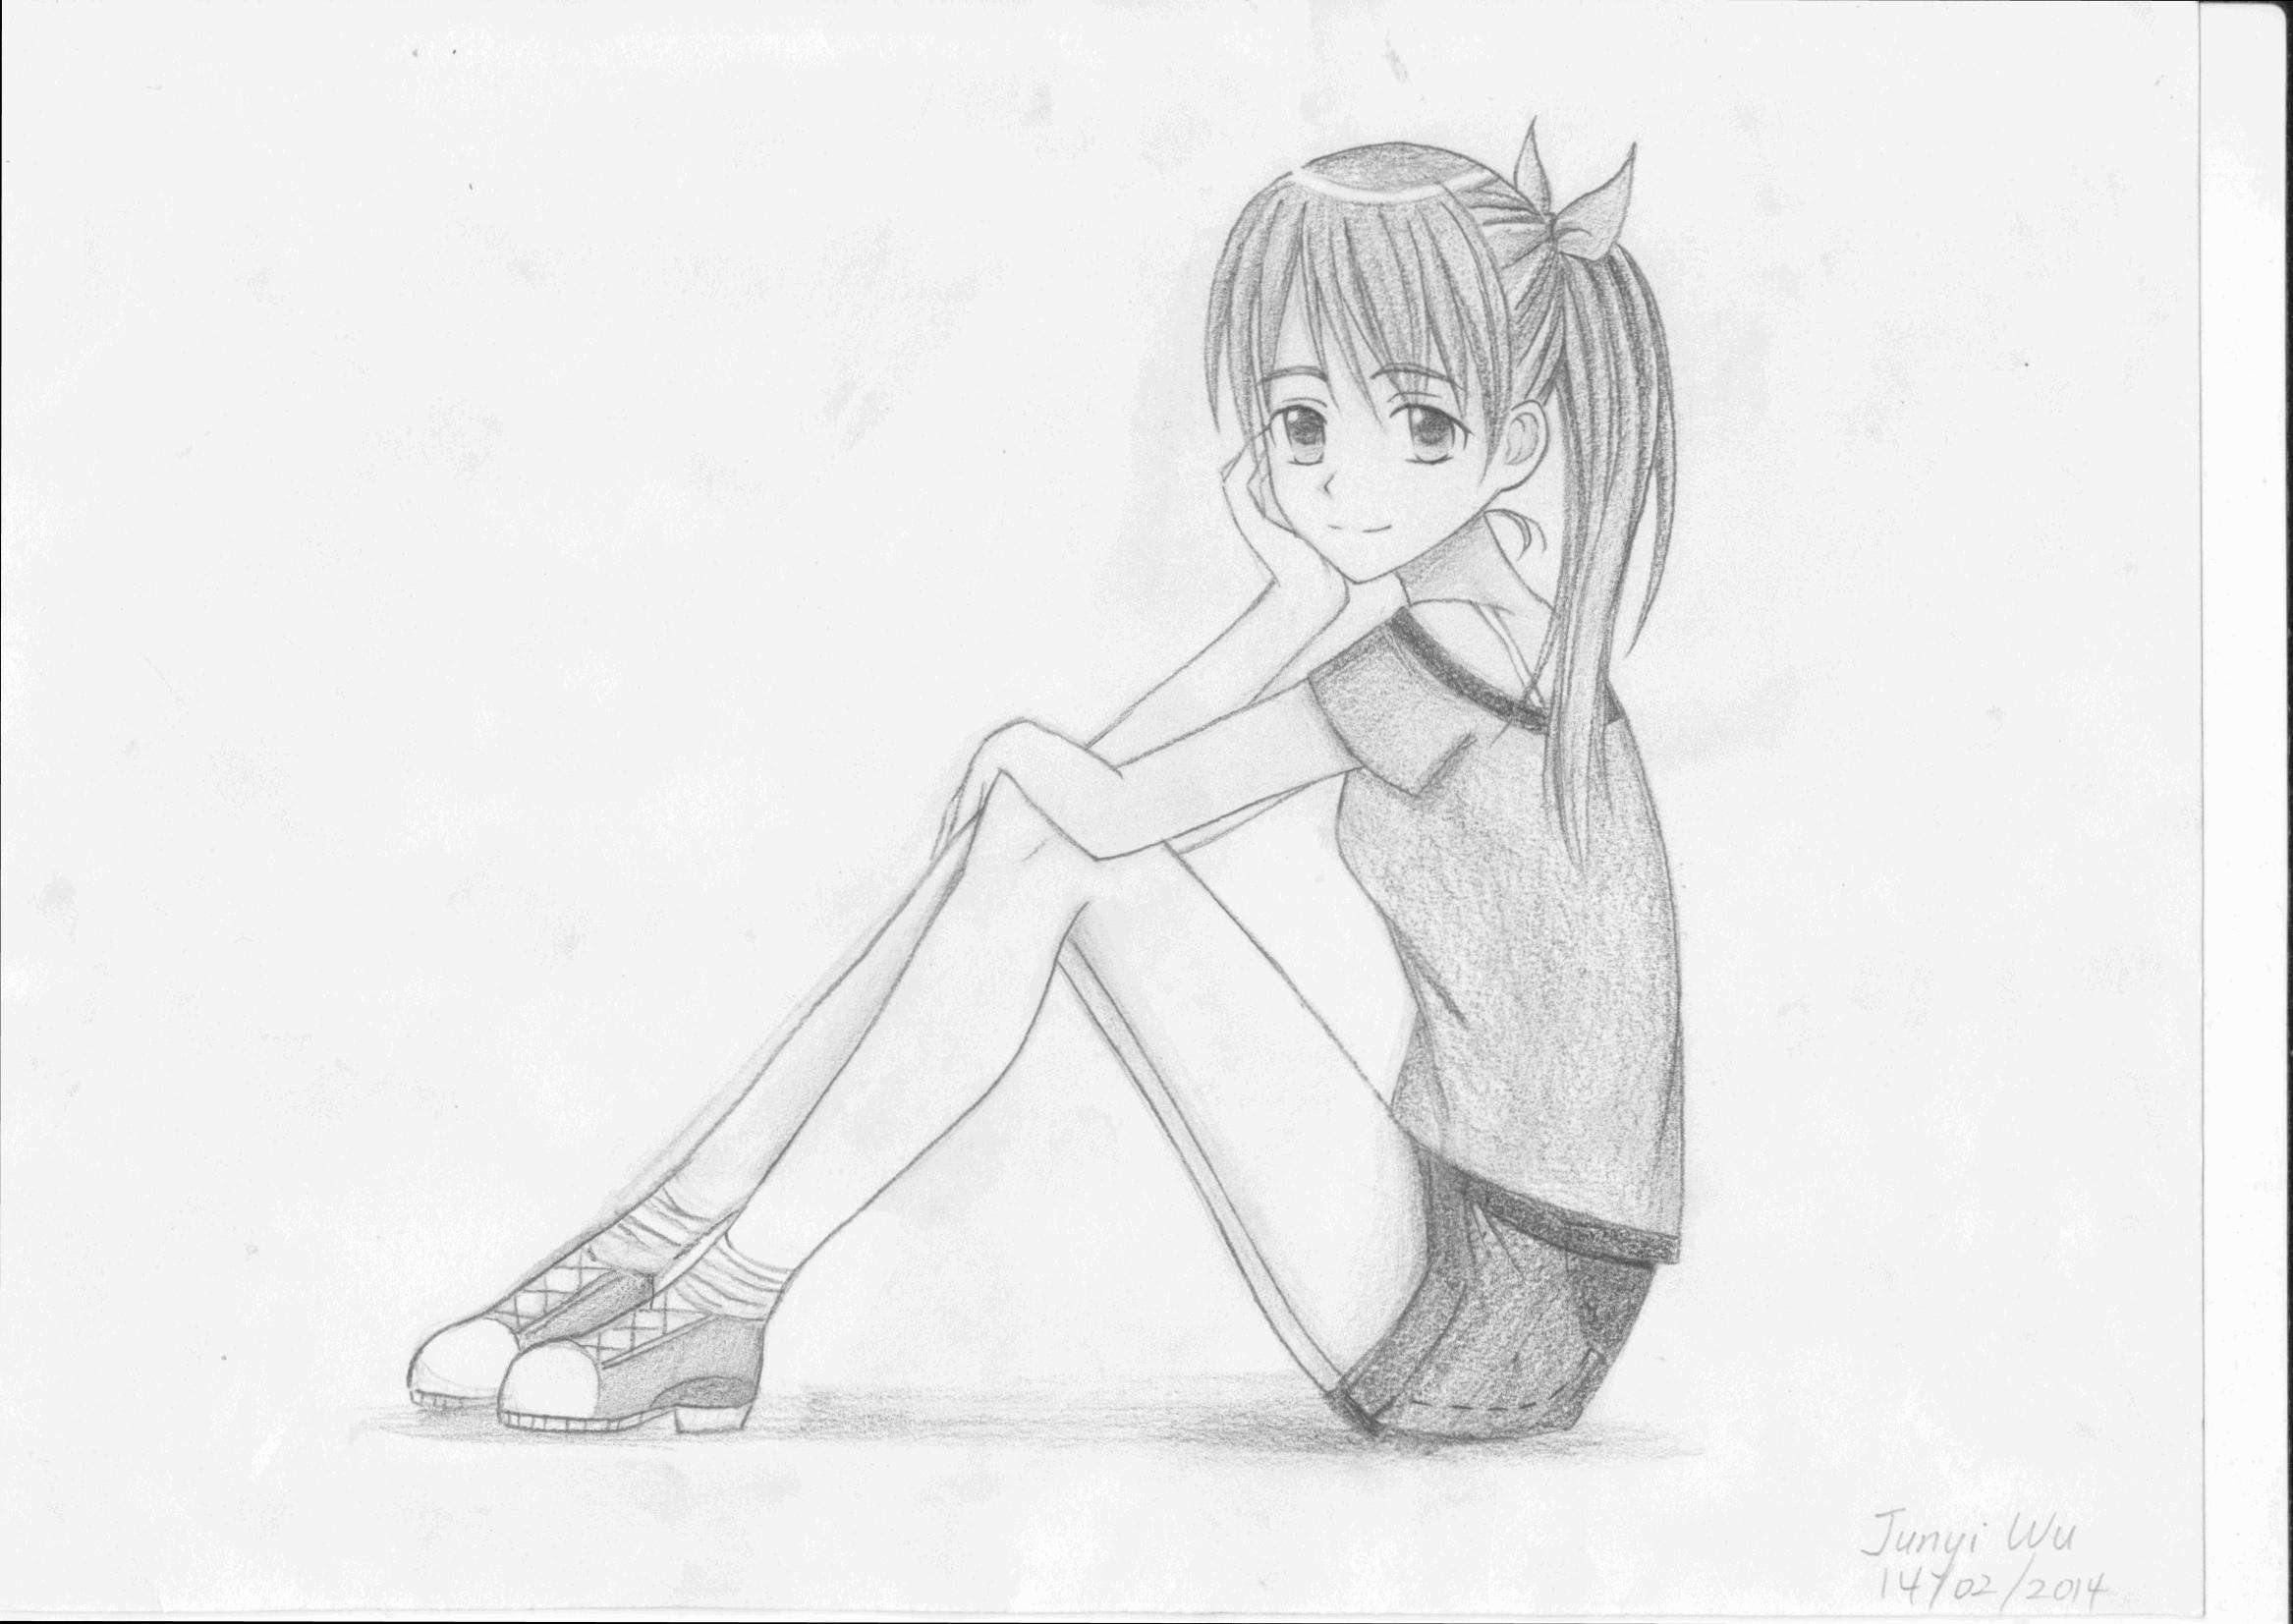 2334x1653 Girl Sitting Sketch Drawing Girl Sitting Sketch Drawing Sketch